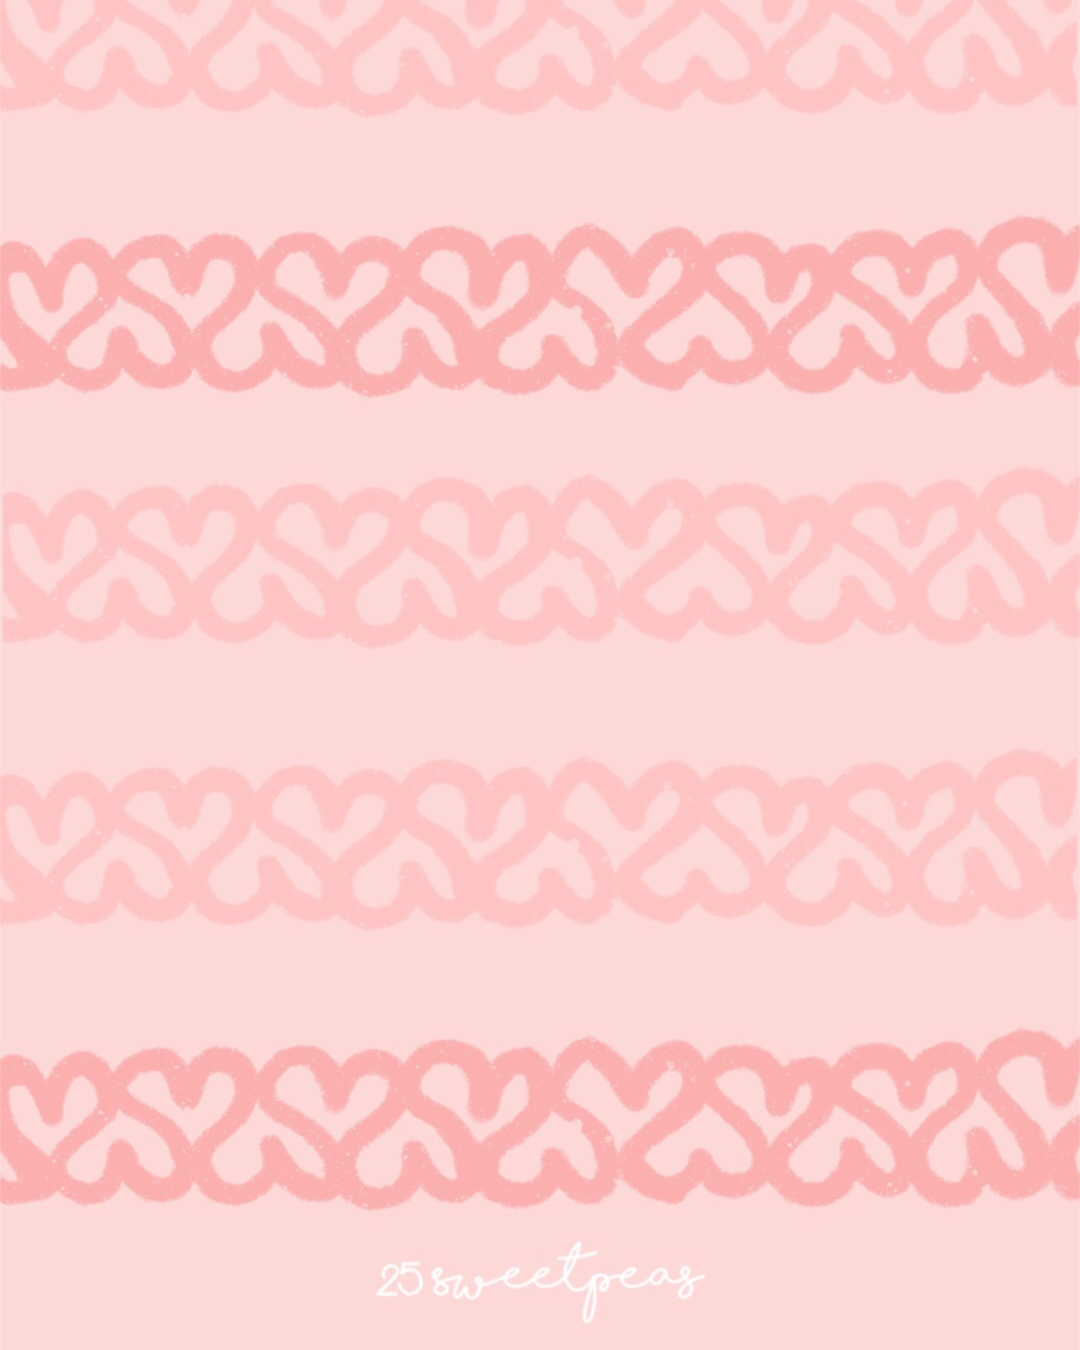 25 Sweetpeas Valentines Wallpaper